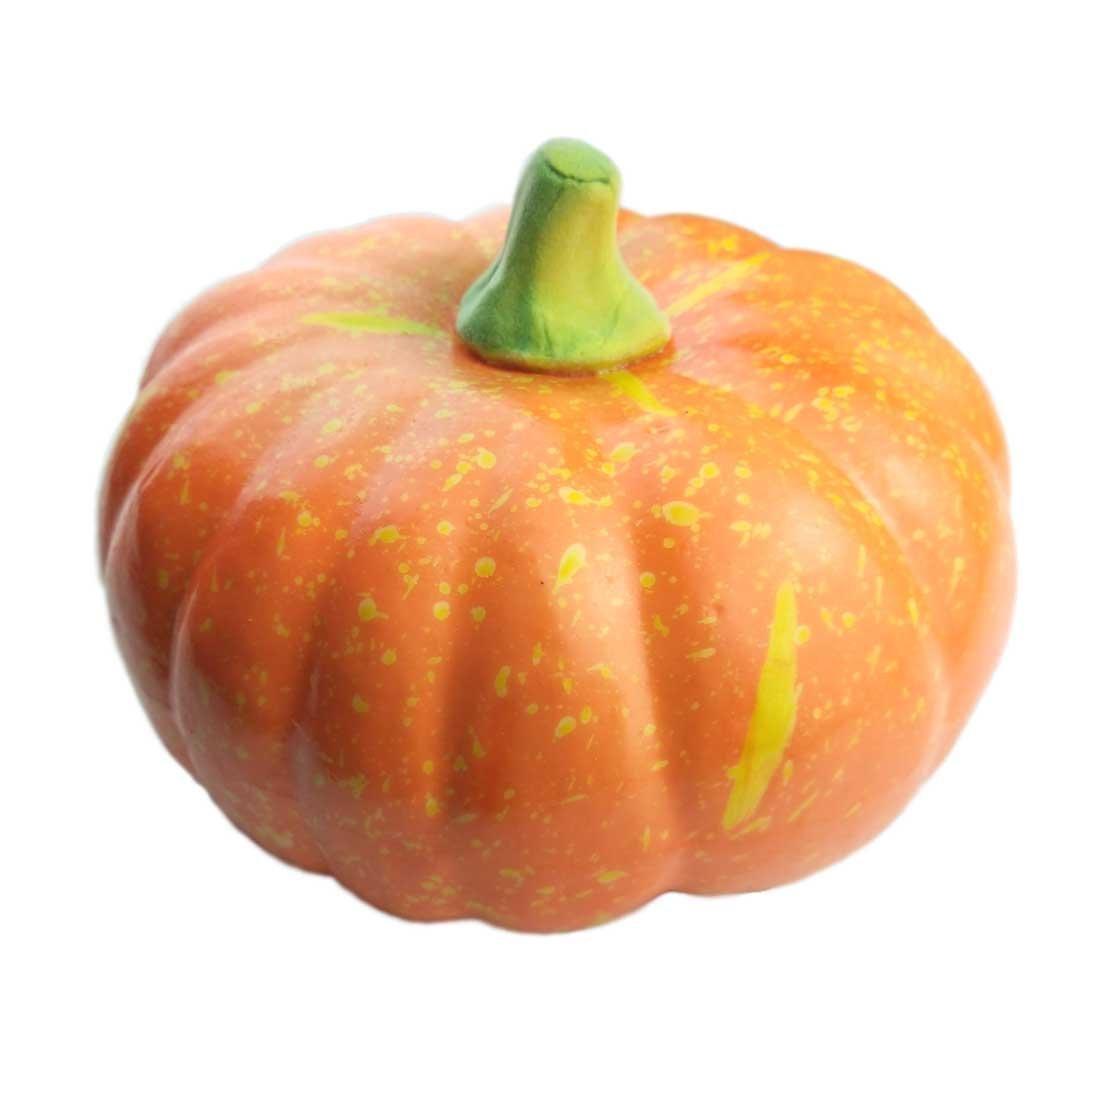 Lorigun Artificial Simulation Big Pumpkin 7.8 Inch Lifelike Fake Vegetable Halloween Home Decoration Company Festive Decor by Lorigun